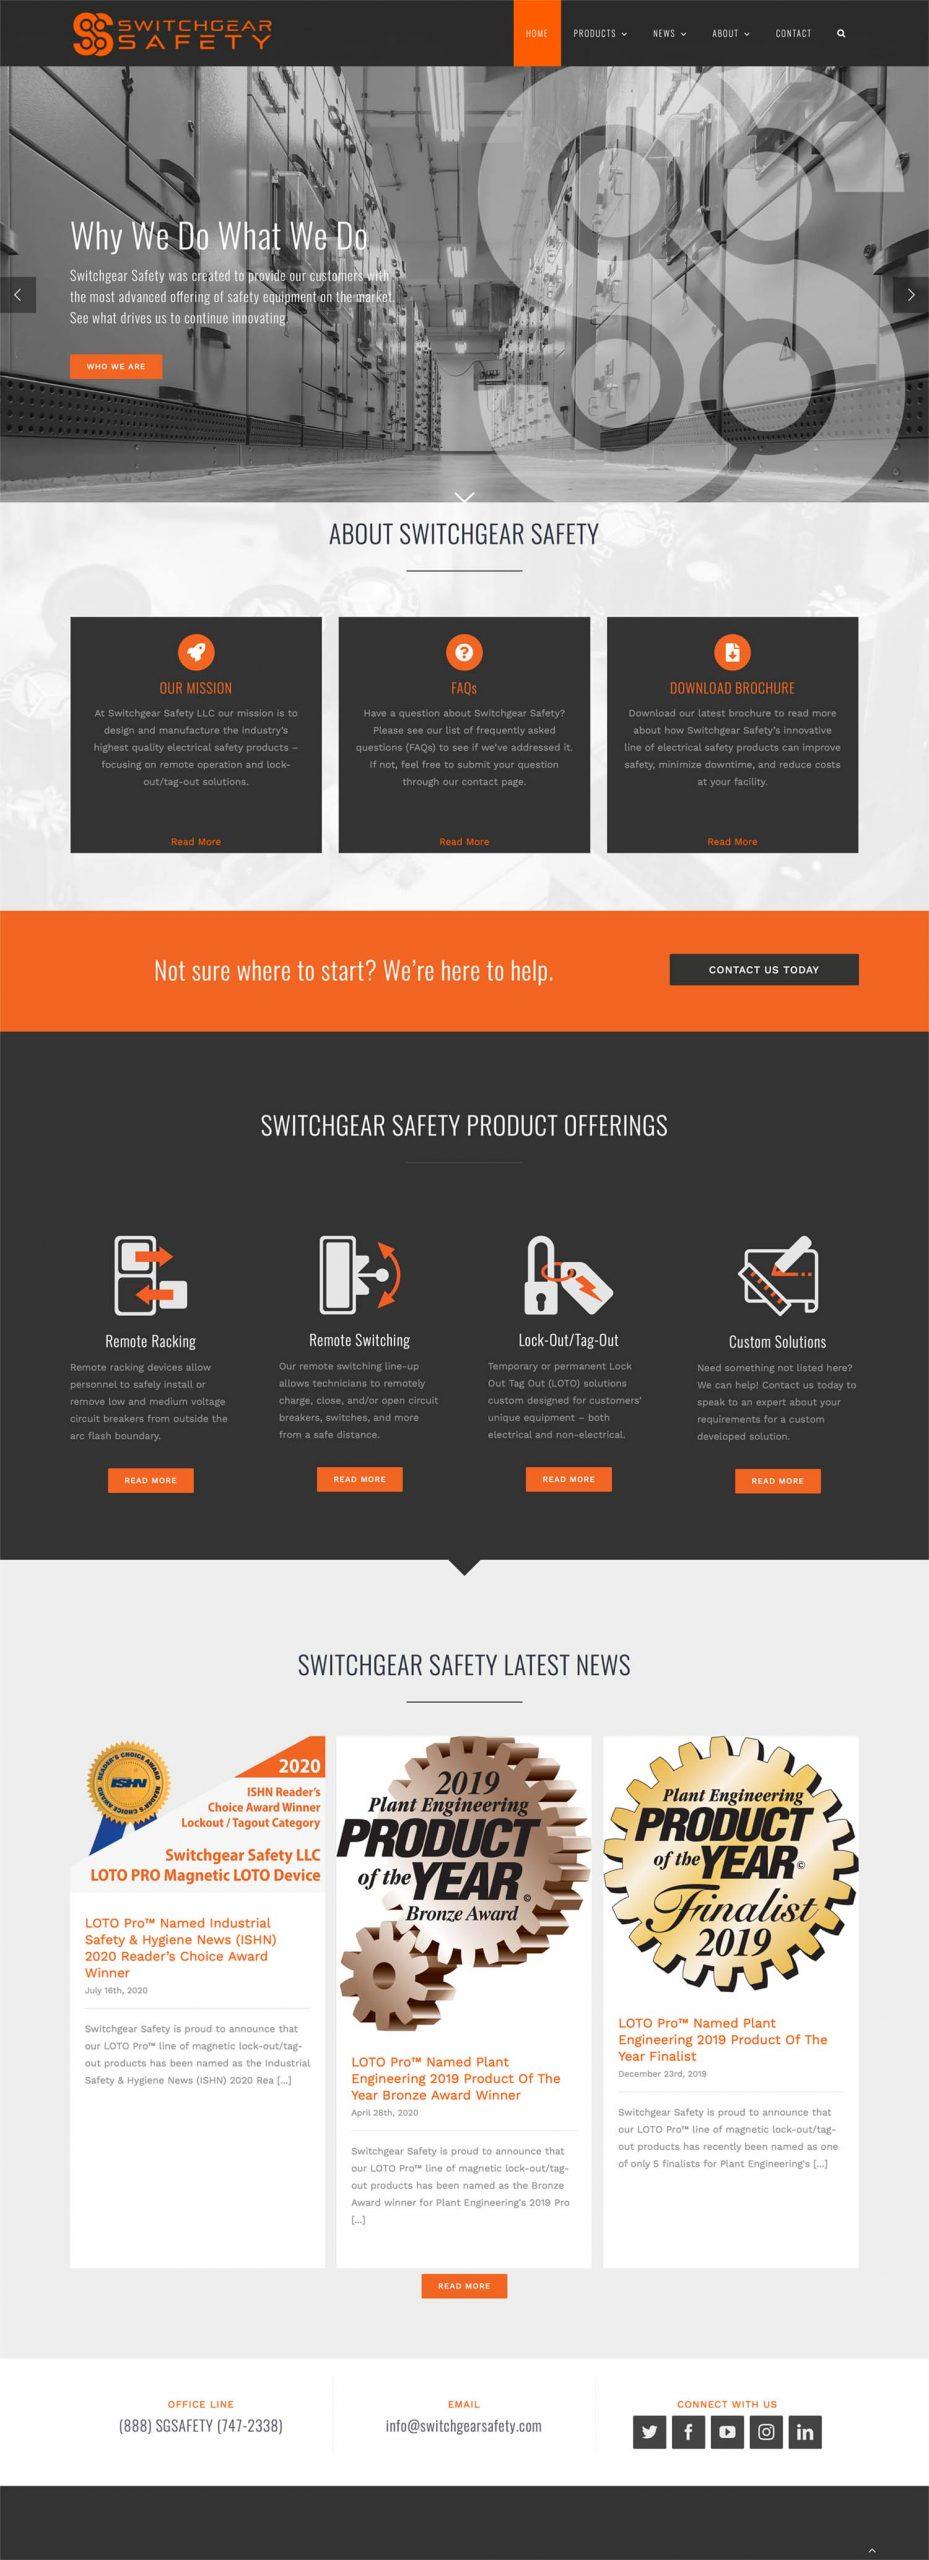 Switchgear Safety Website Mockup